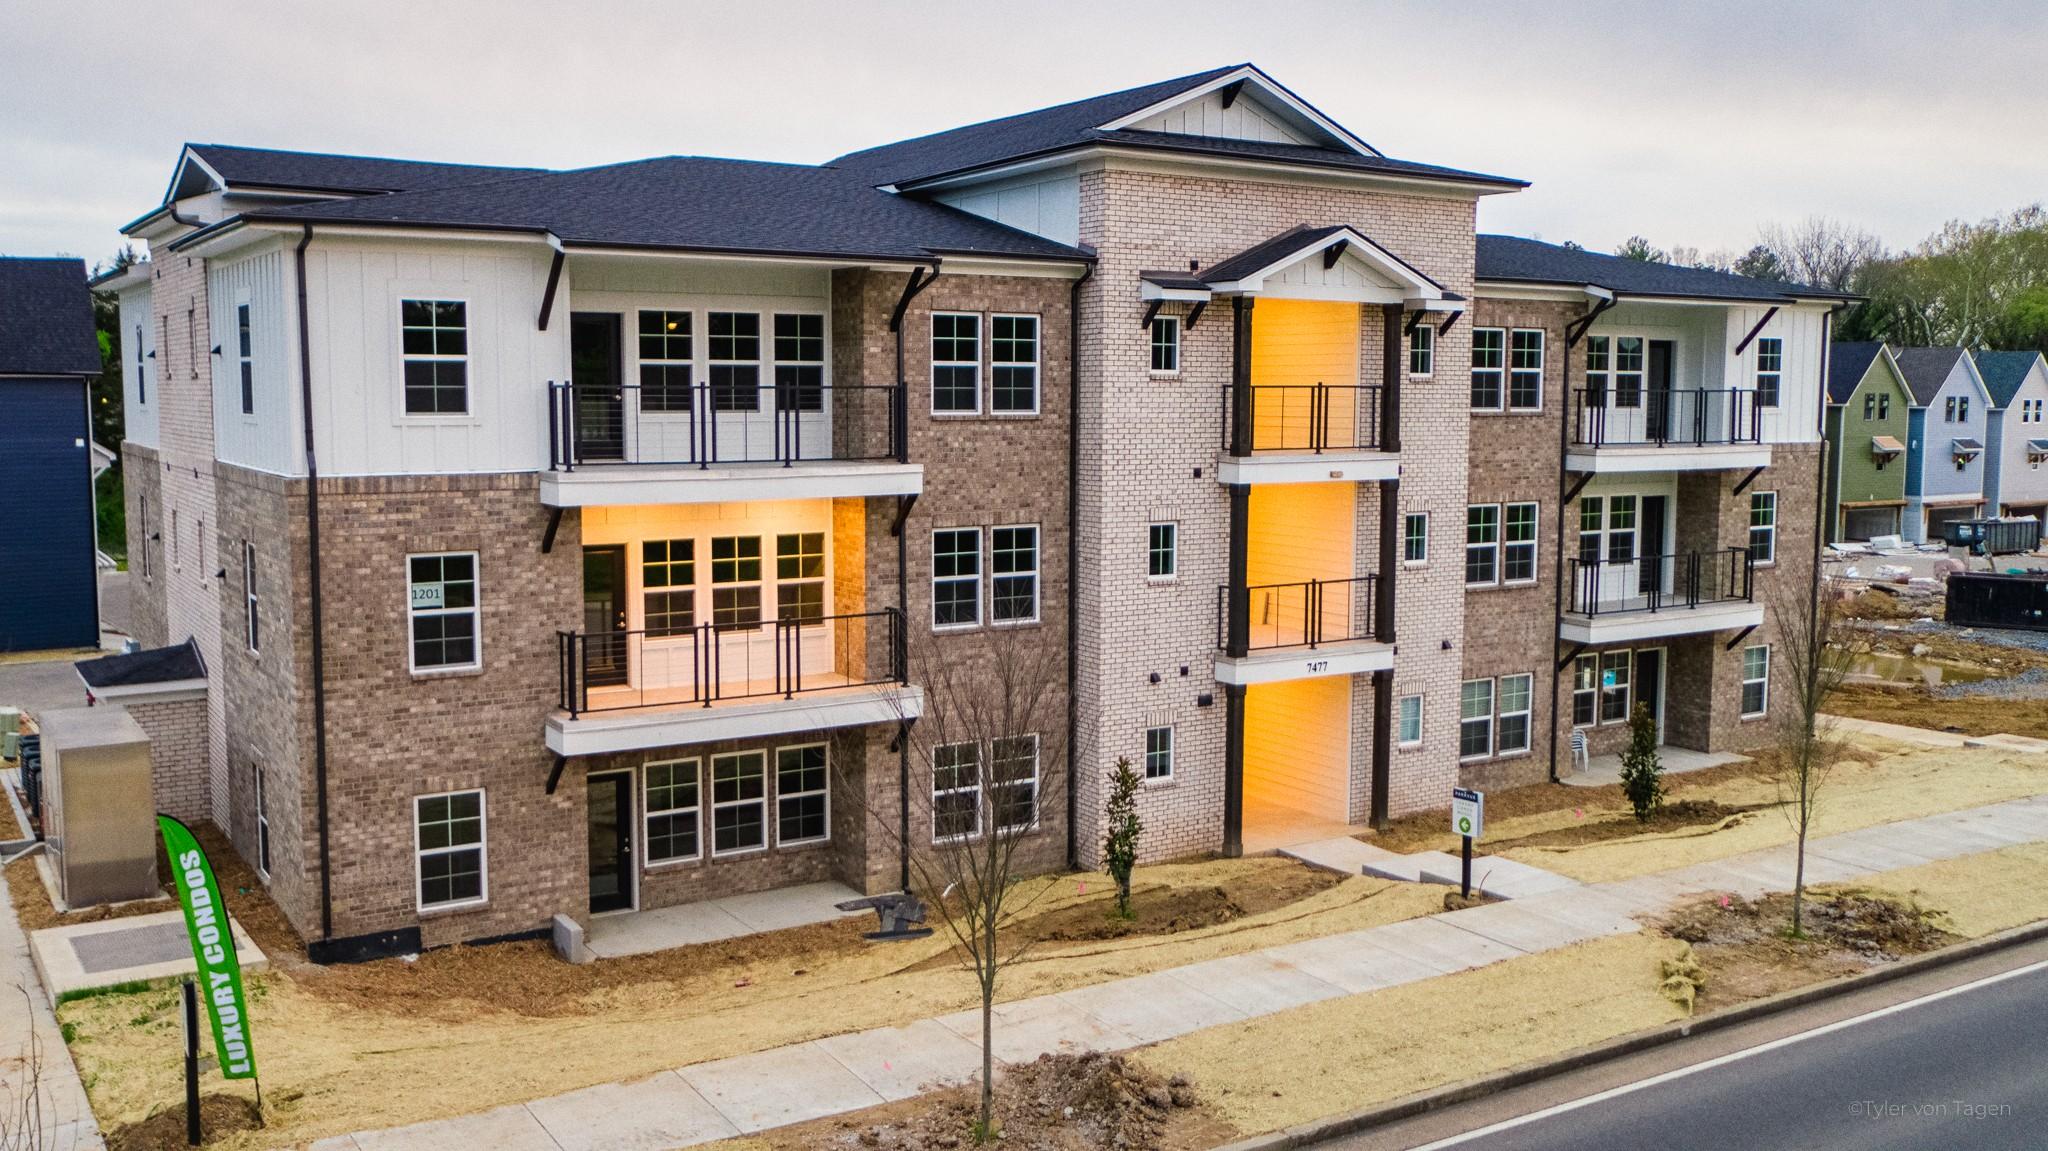 7483 Hwy 70S Unit 301, Nashville, TN 37221 - Nashville, TN real estate listing